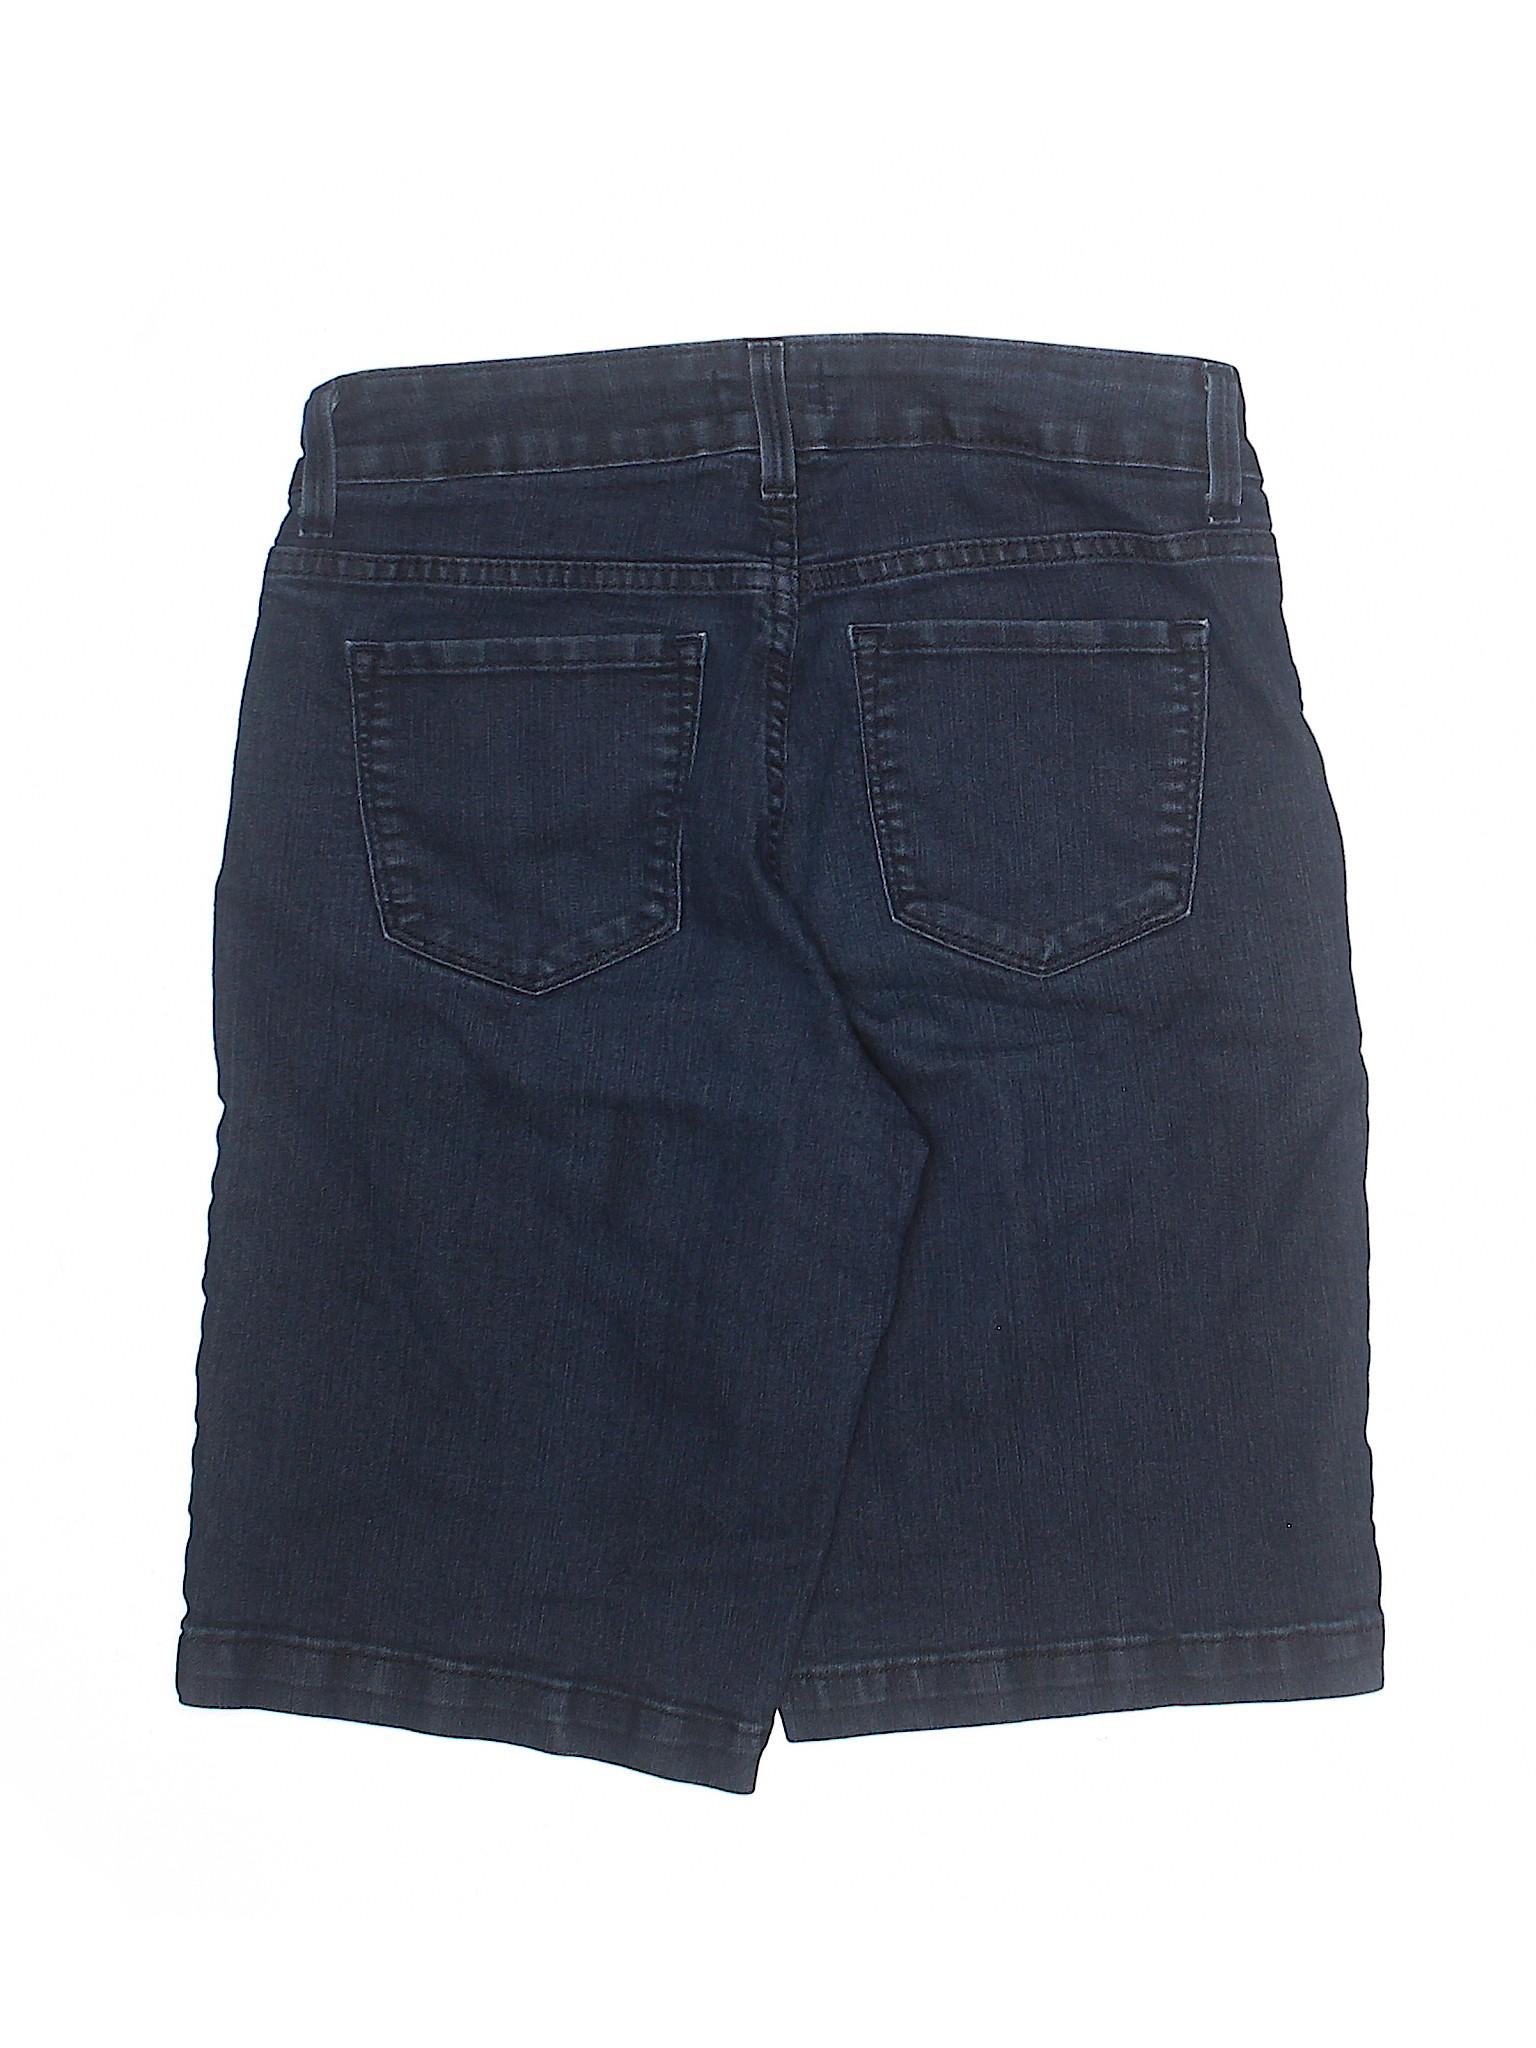 NYDJ Denim Denim Boutique NYDJ NYDJ NYDJ Boutique Denim Boutique Boutique Shorts Shorts Denim Shorts Aqx8Z